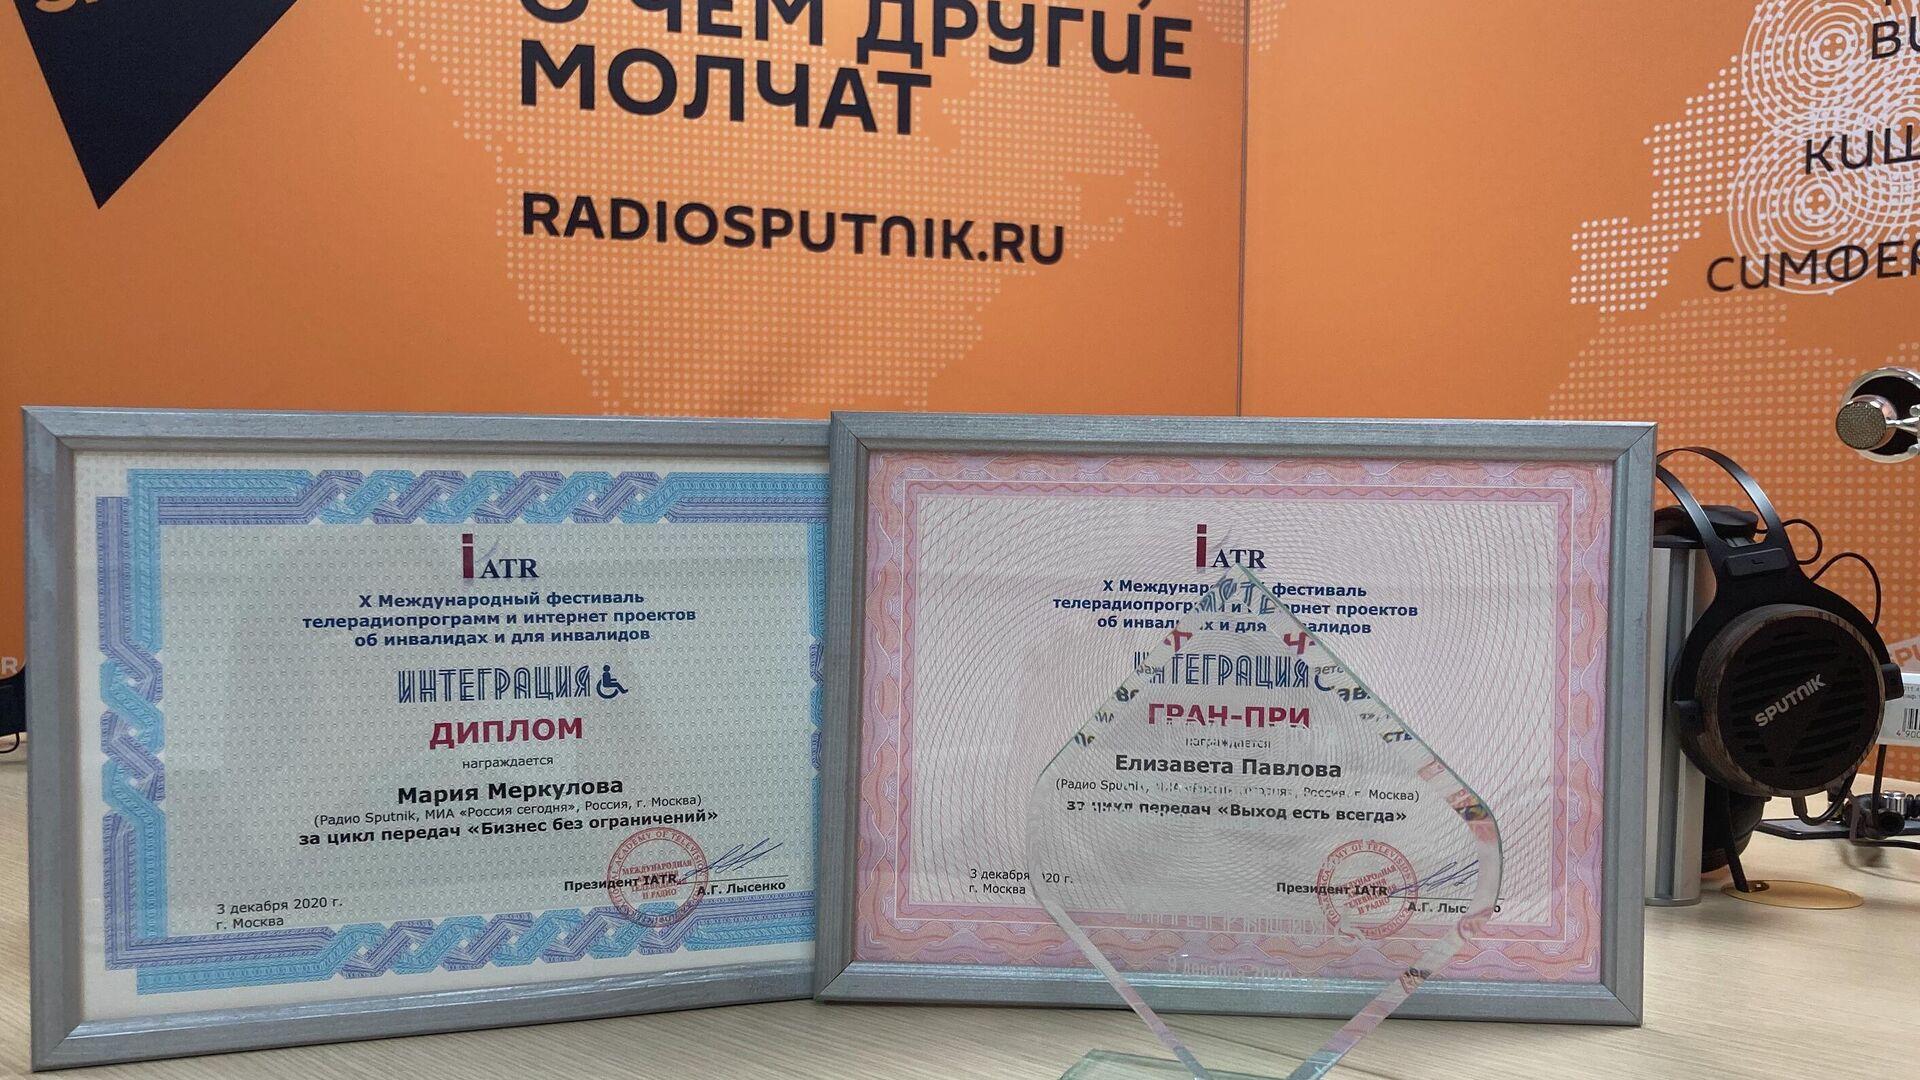 Два журналиста радио Sputnik стали лауреатами фестиваля Интеграция - РИА Новости, 1920, 04.12.2020